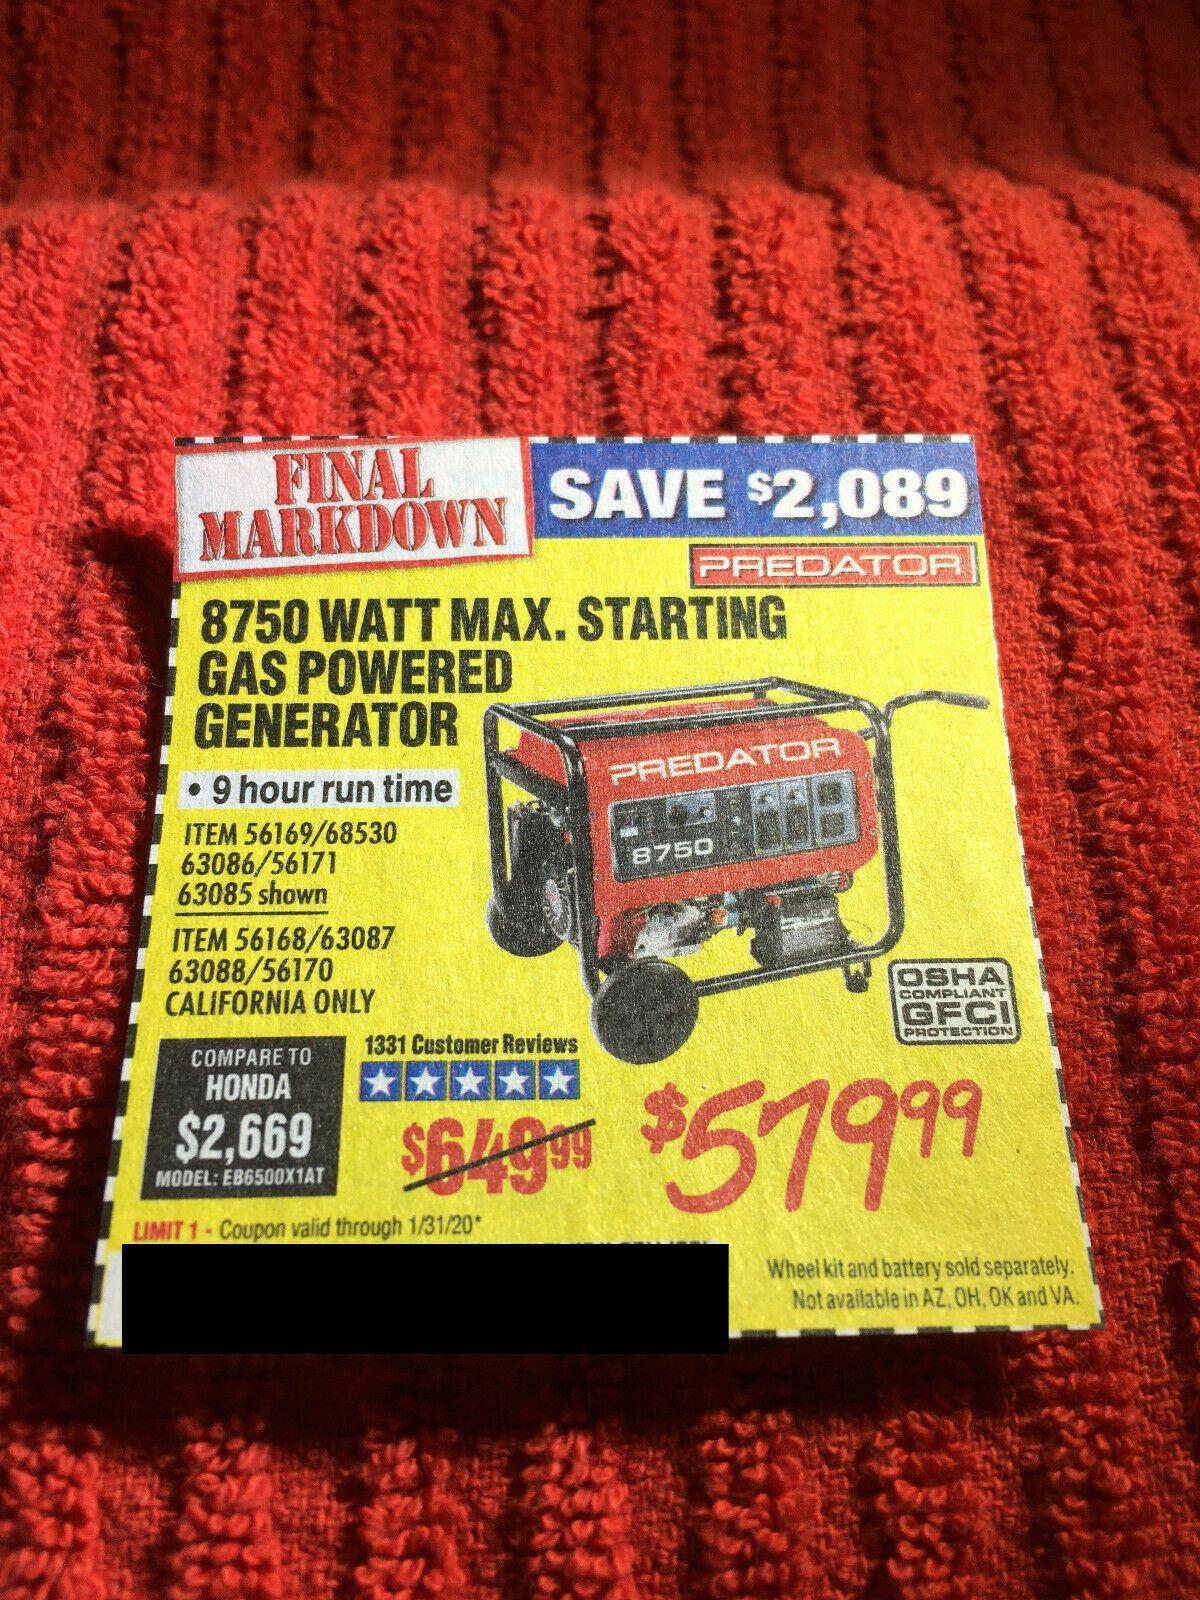 Coupon to save on 8750 Watt Max Starting Gas Generator